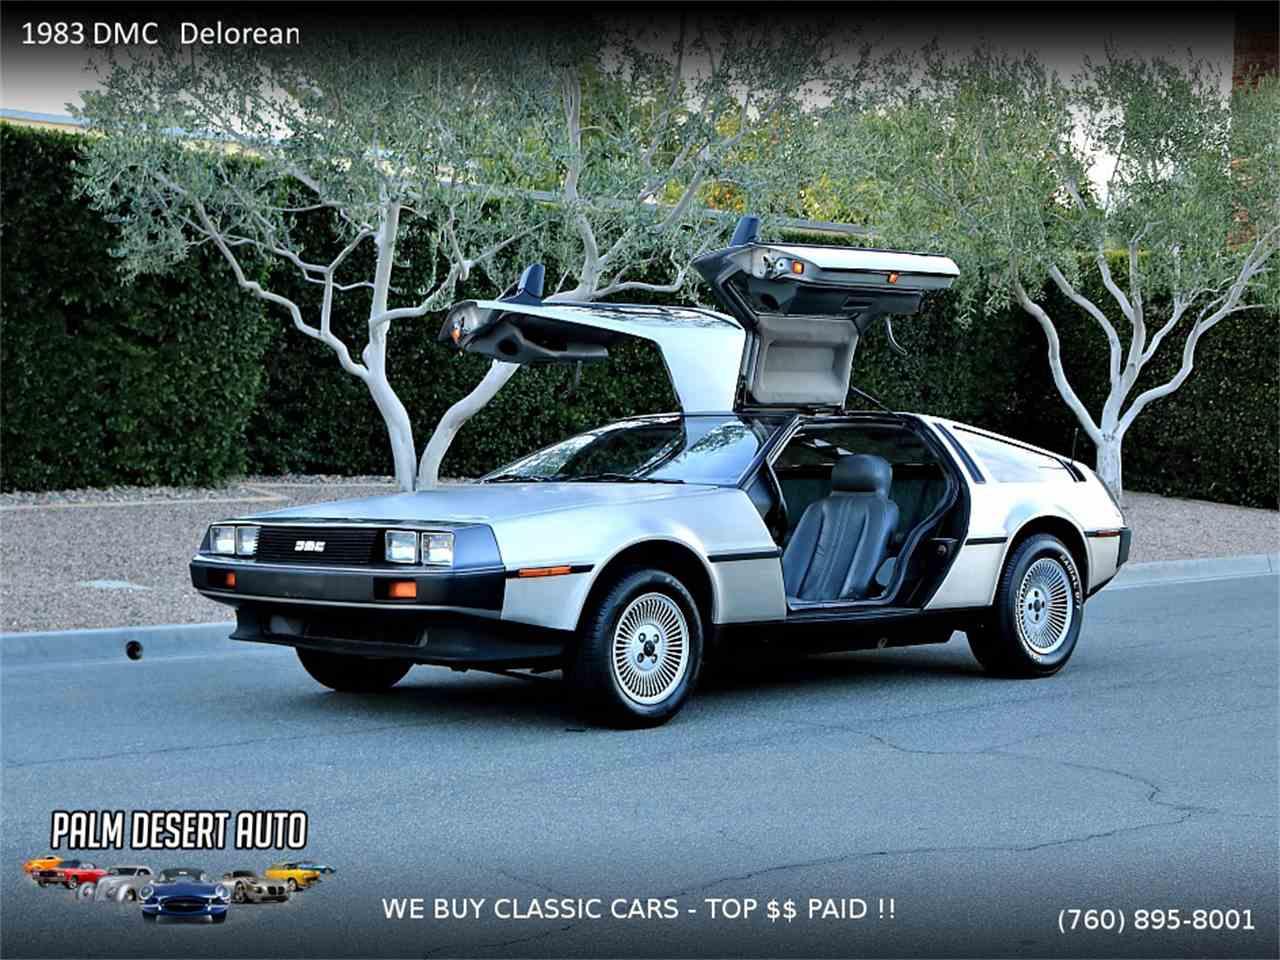 1983 DeLorean DMC-12 for Sale | ClassicCars.com | CC-1058211